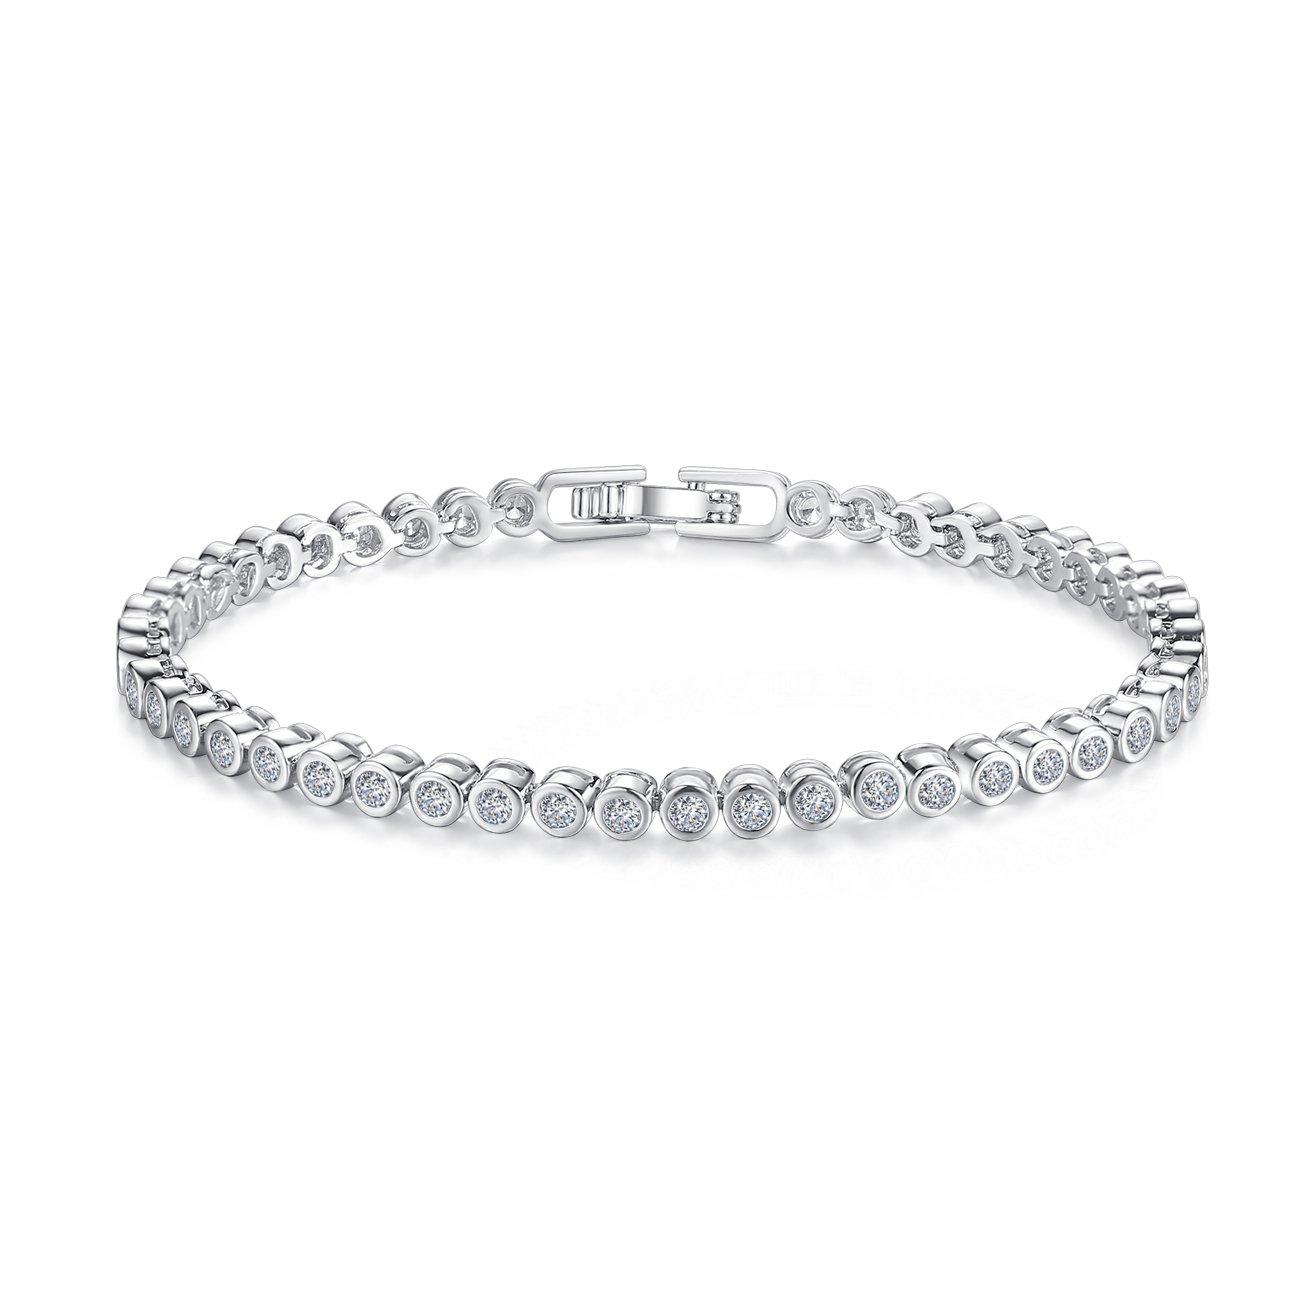 CZ Tennis Bracelets For Women - Never Hook Clothes Bracelets18K Rhodium Plated Round Cut Bezel Setting 6.7''& 7.5'', (7.5in)